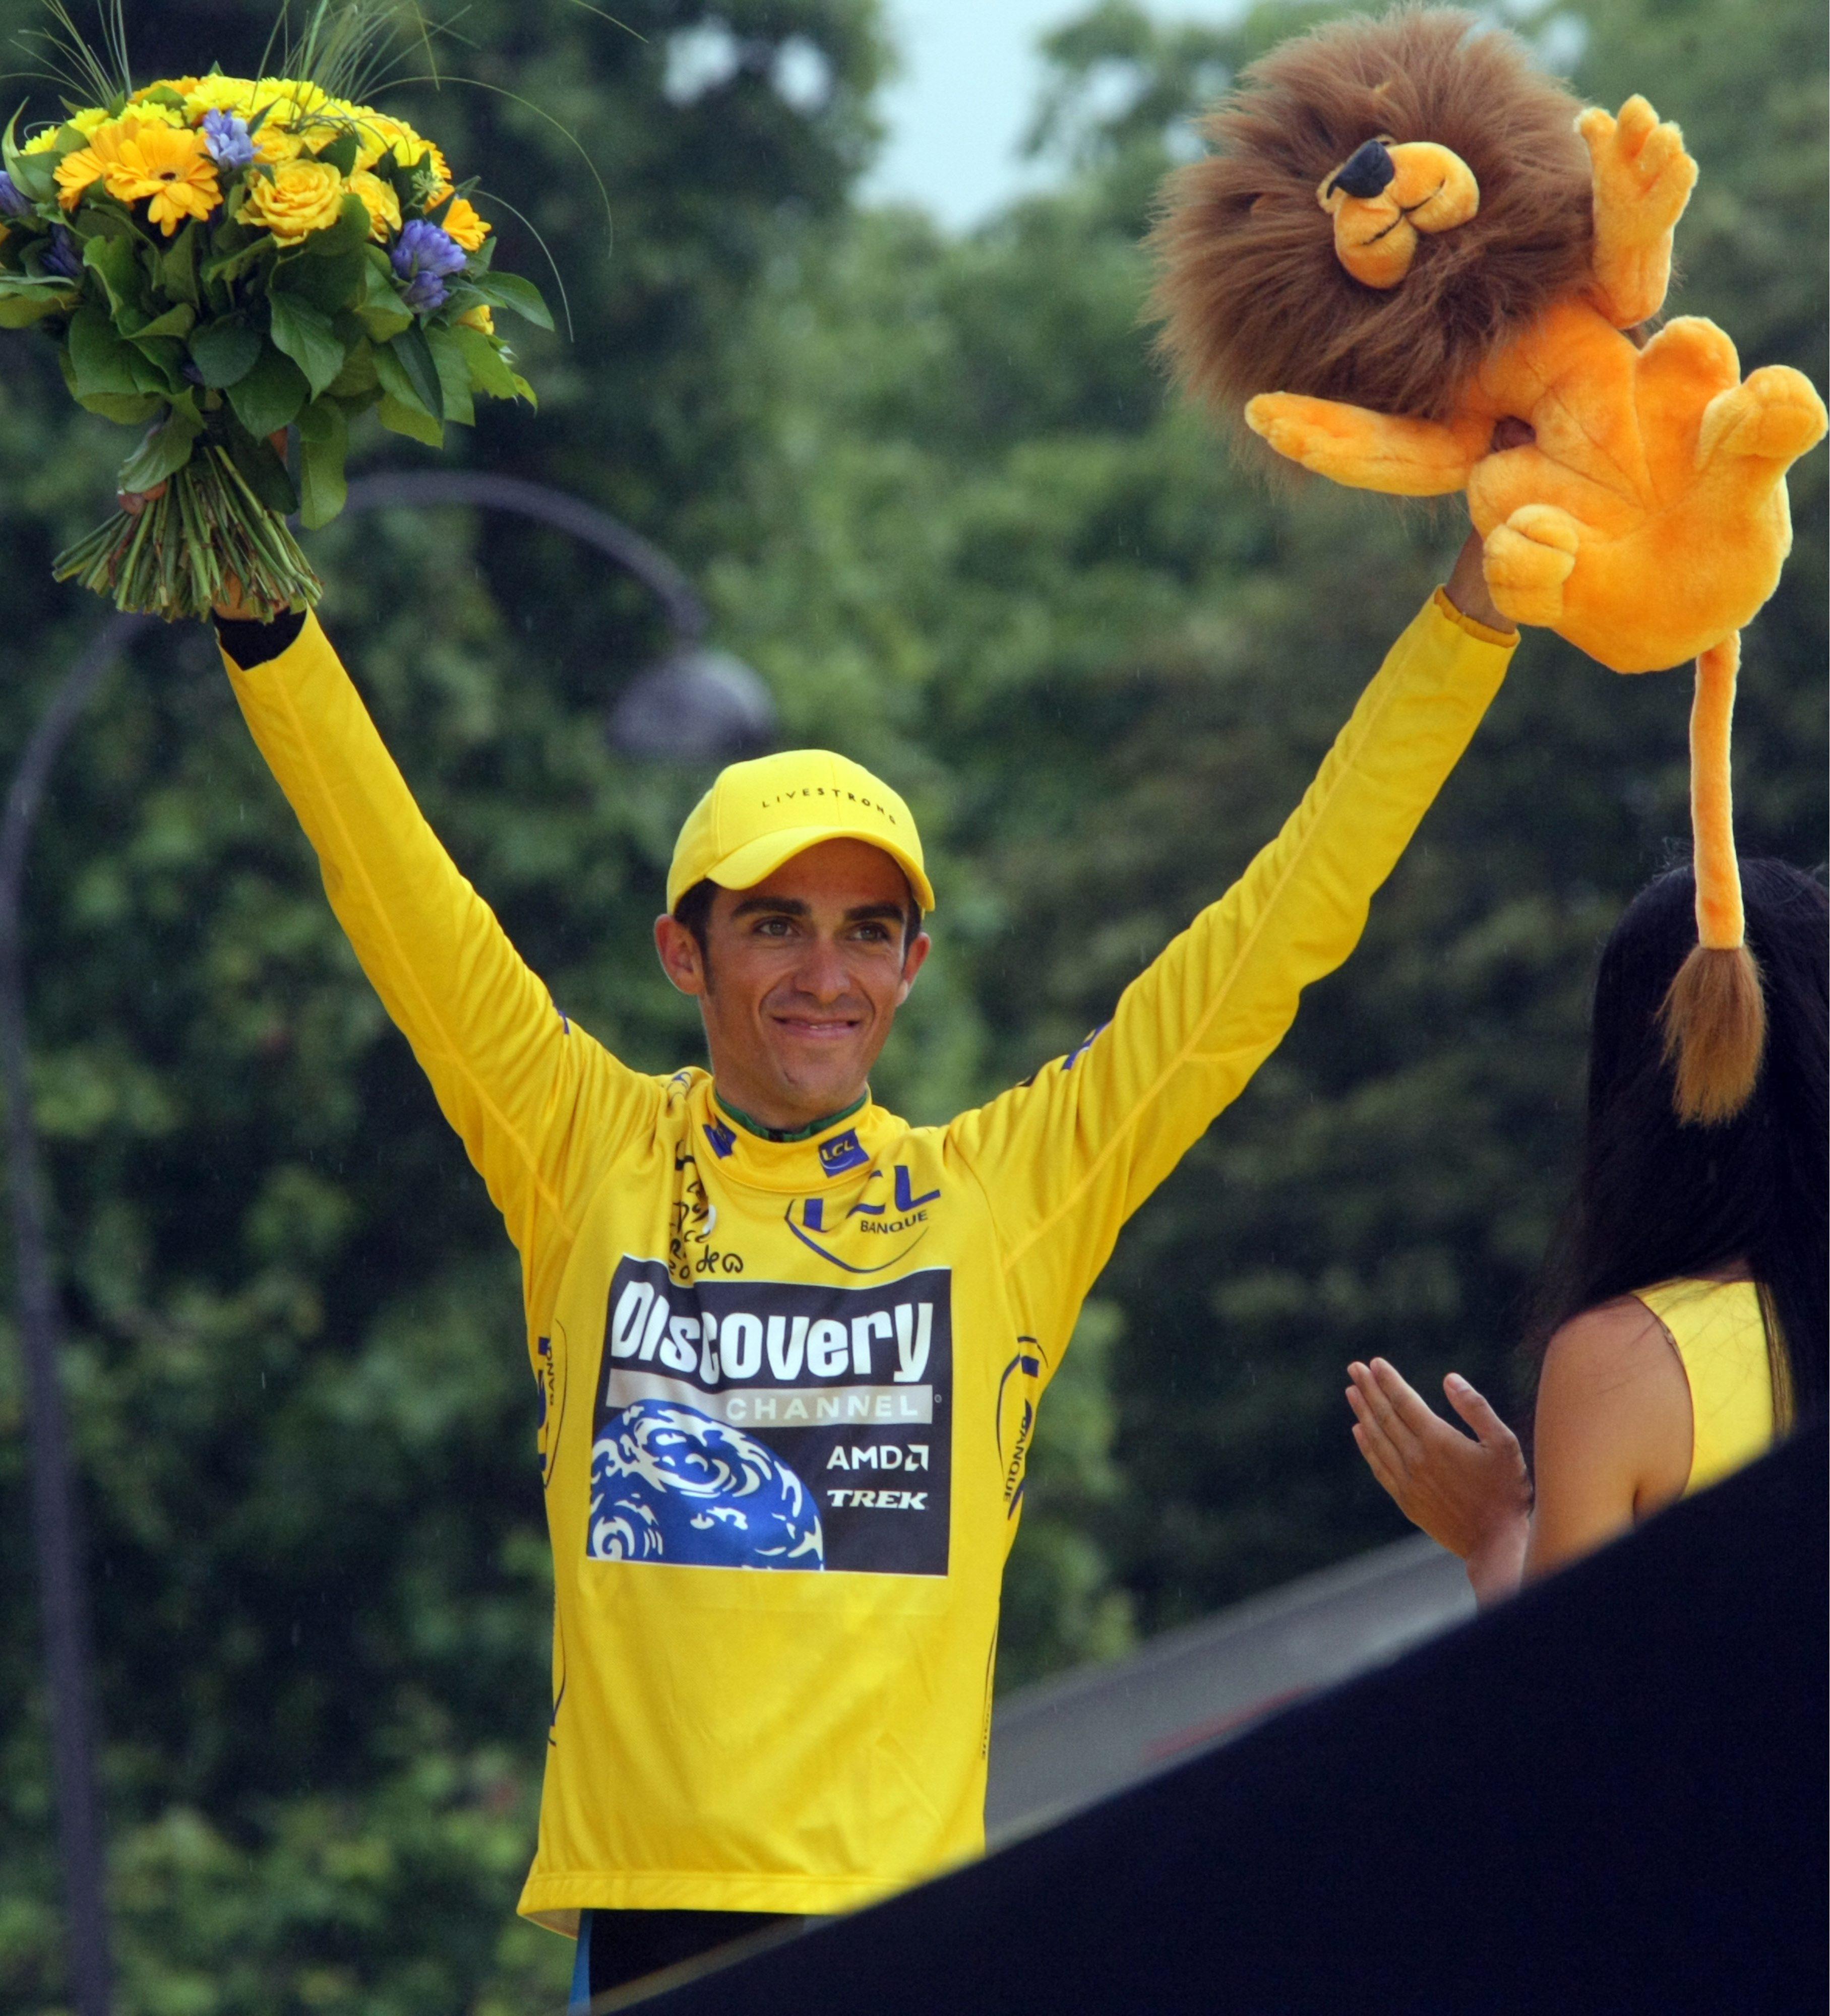 CONTADOR - - - Ganador del Tour 2010!! Contador